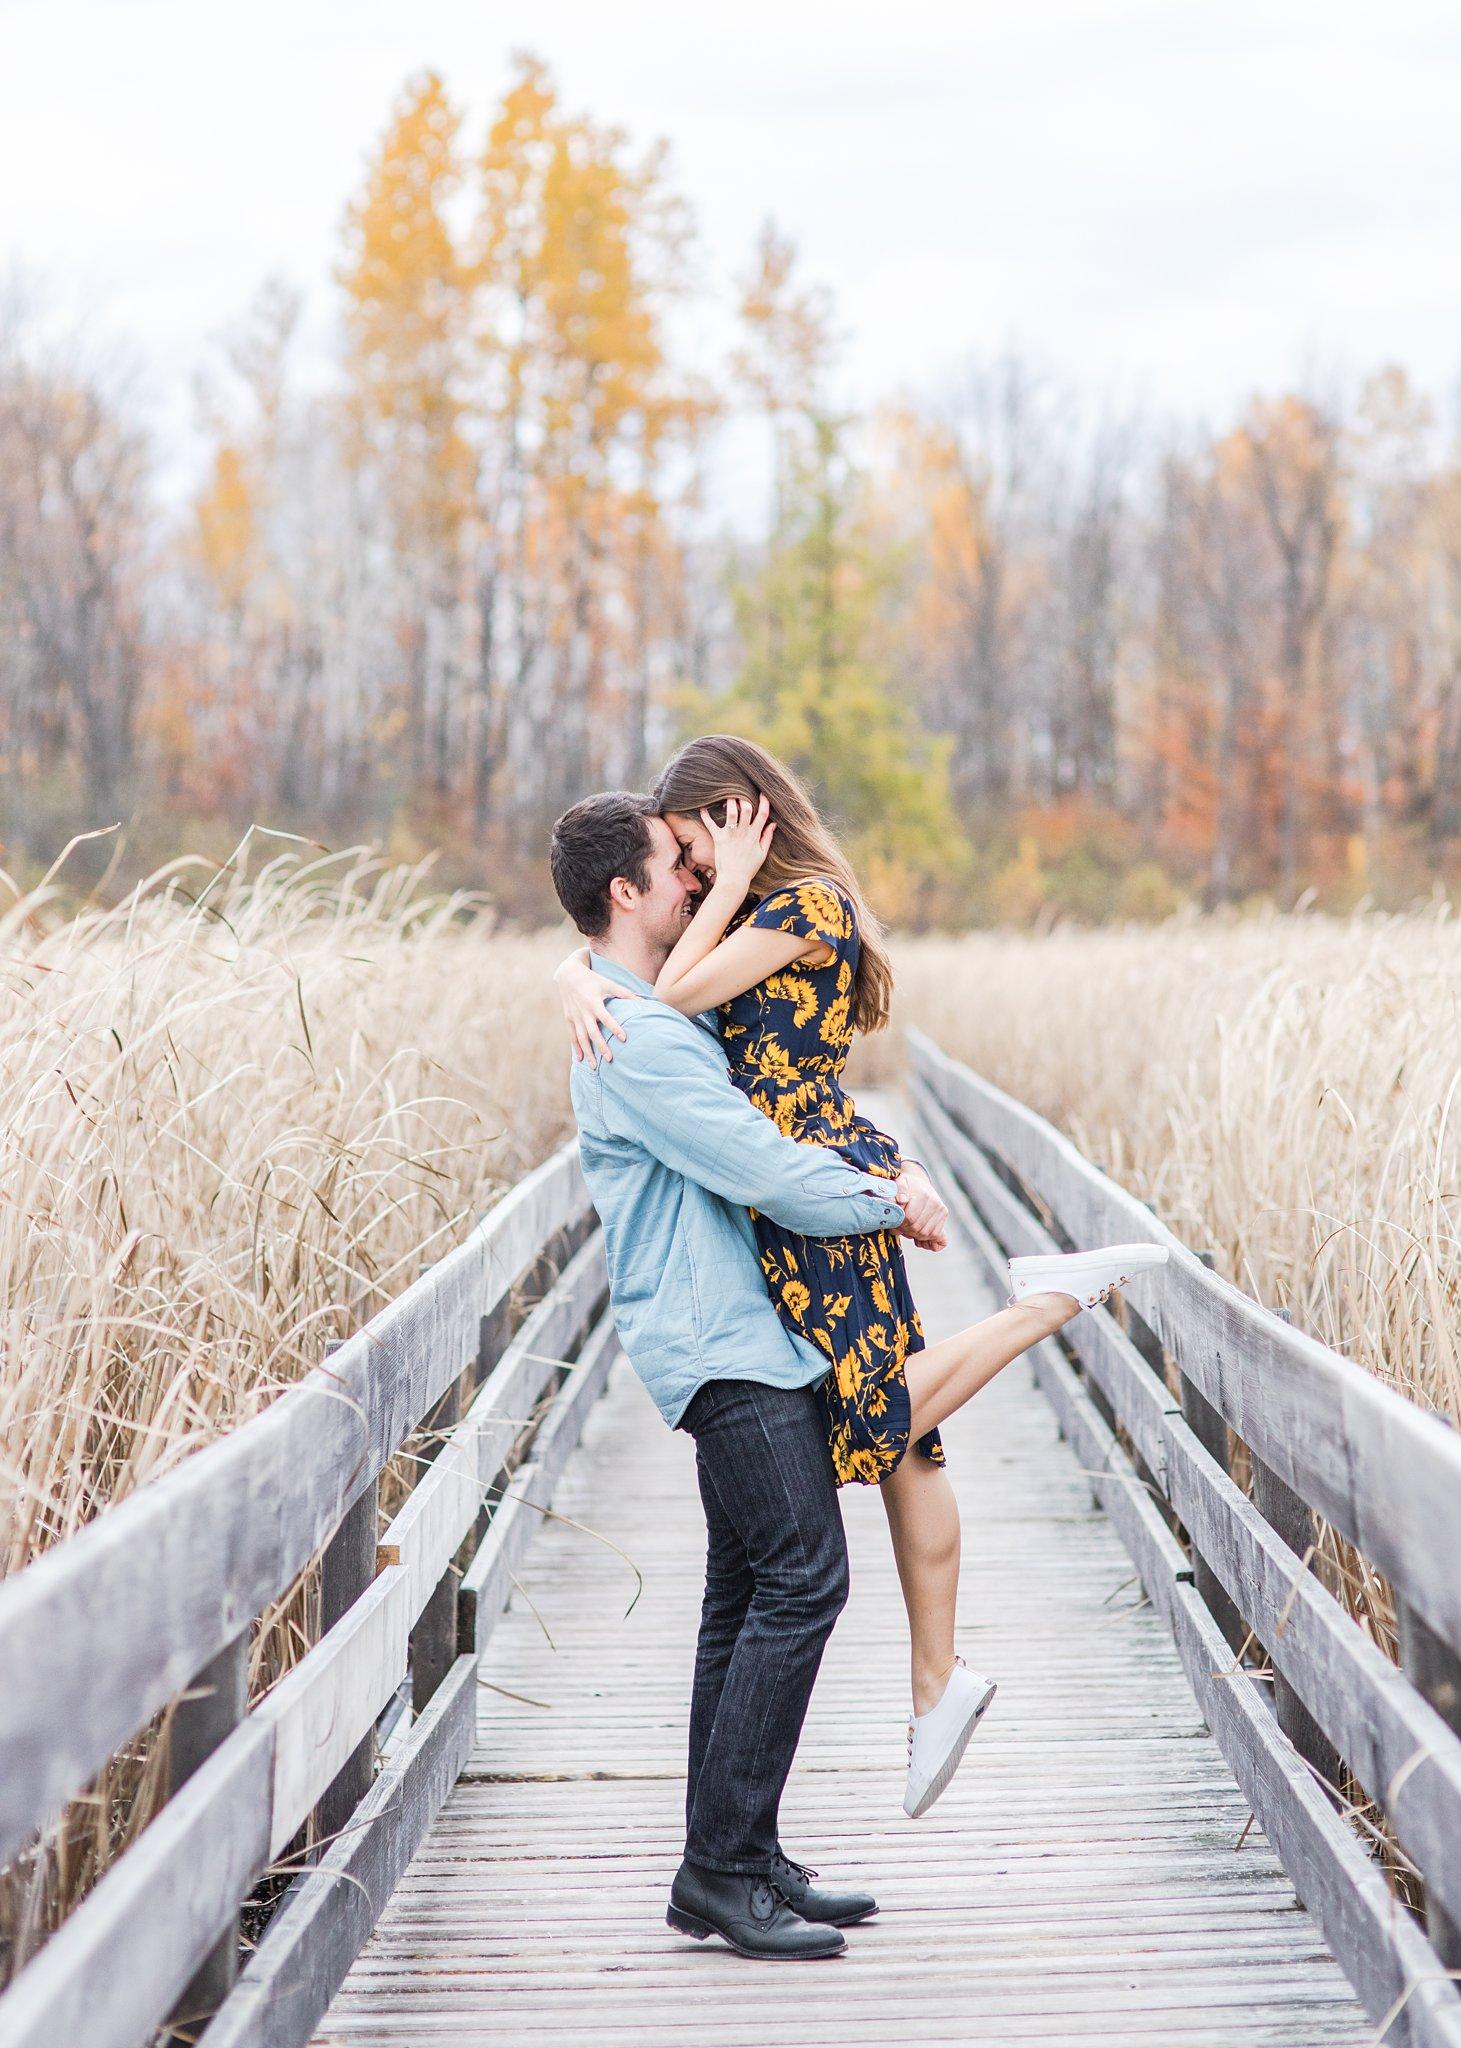 Fiance lifts his bride after proposal Mer Bleue Boardwalk Engagement Photos